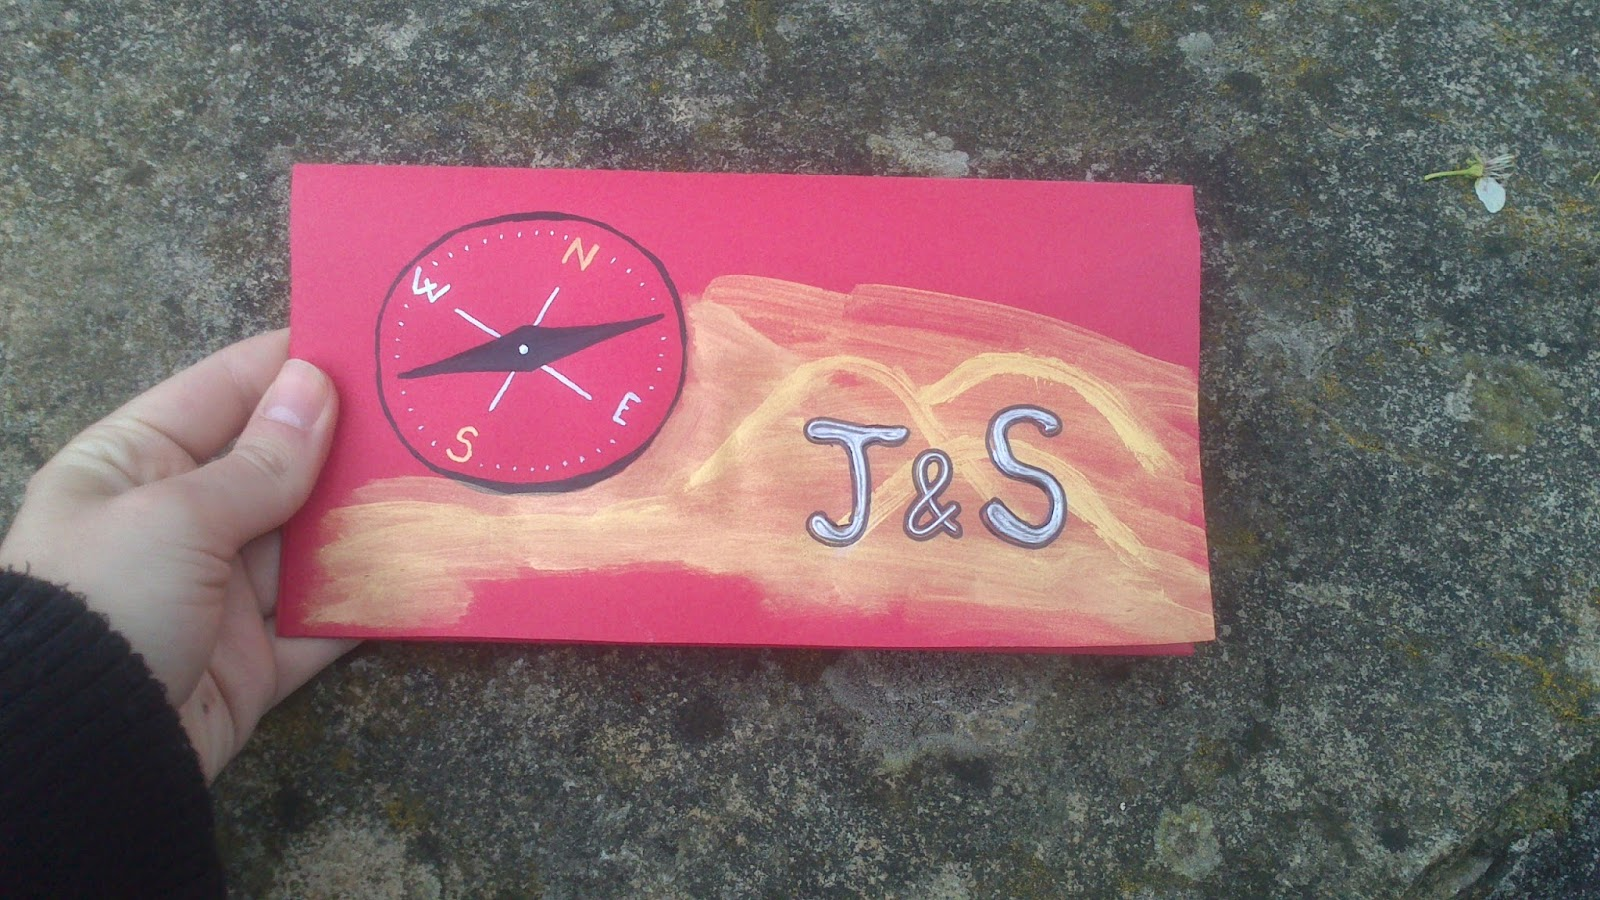 Crgc DIY tarjeta regalo boda J&S brújula